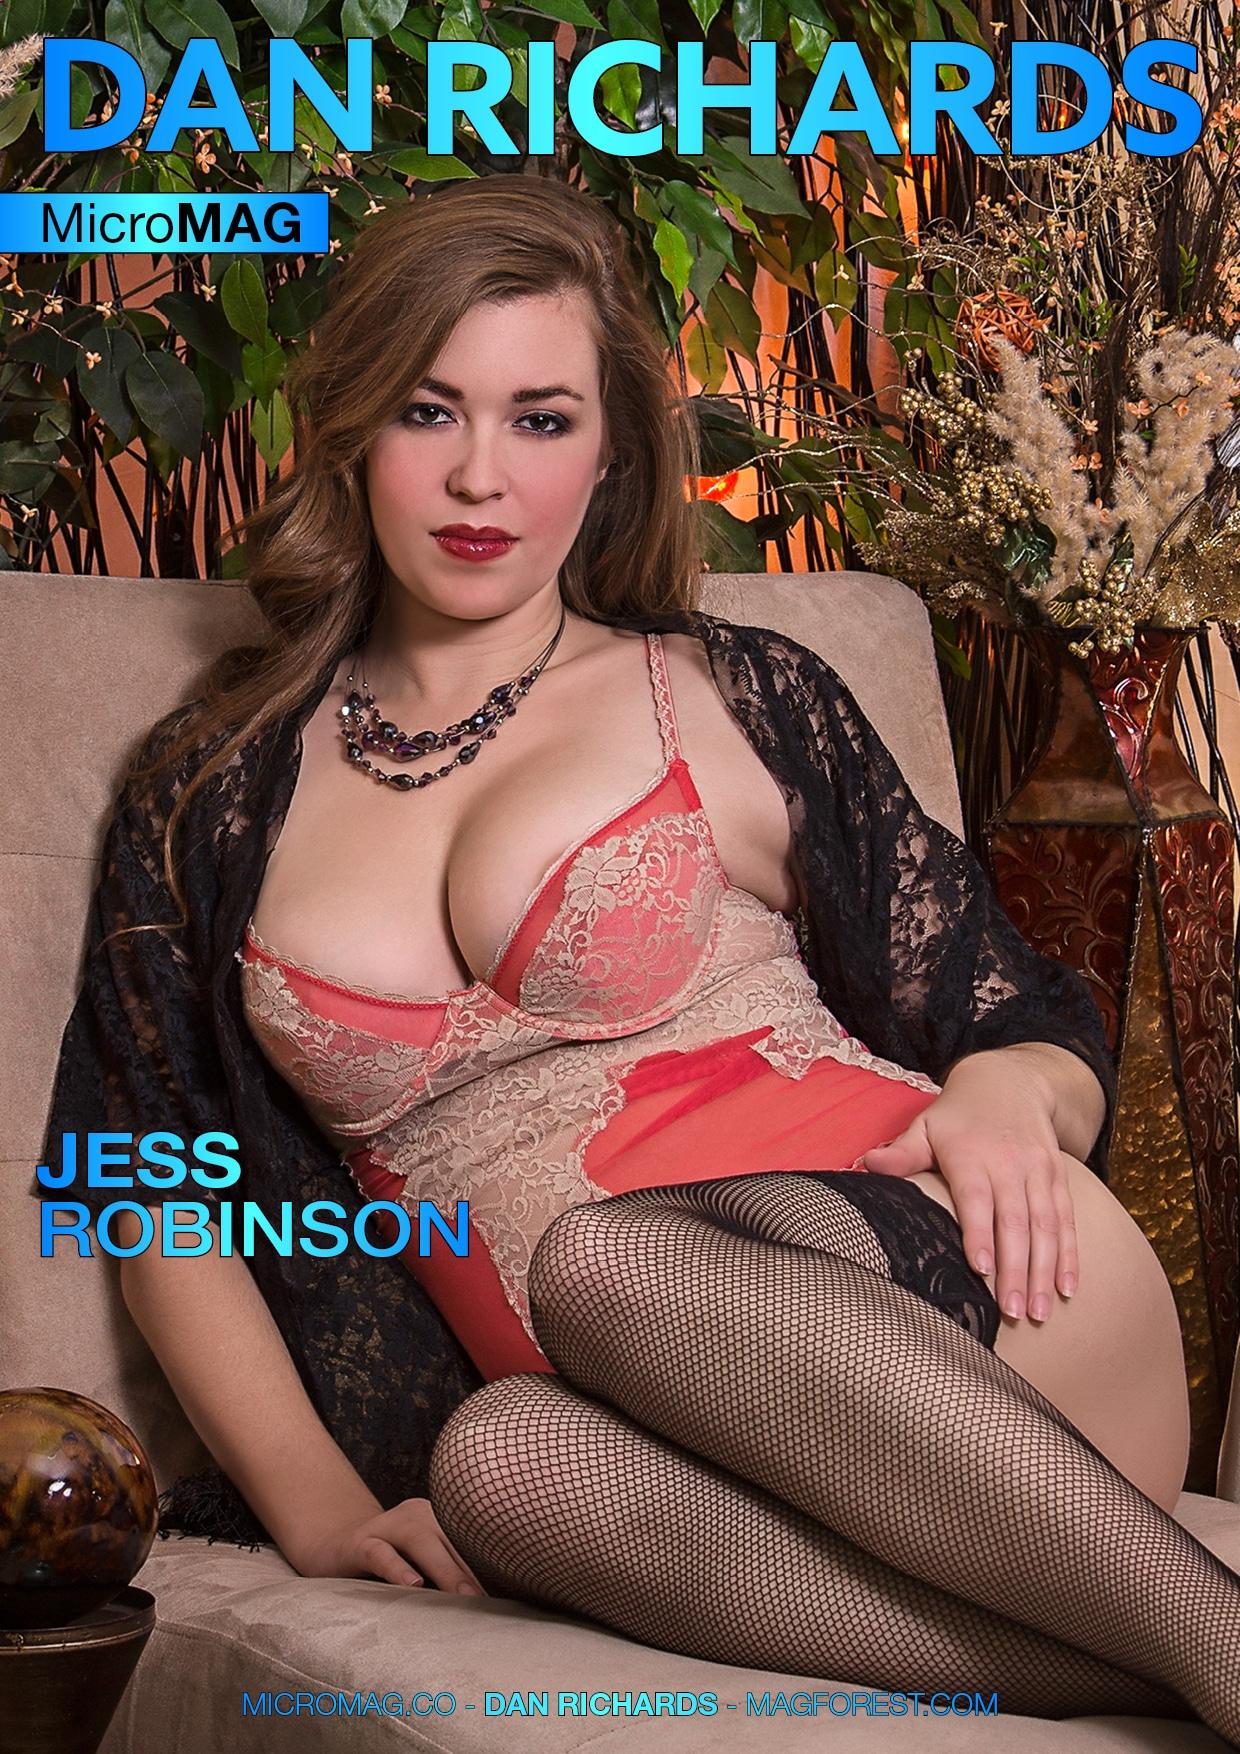 Dan Richards Micromag – Jess Robinson – Issue 1